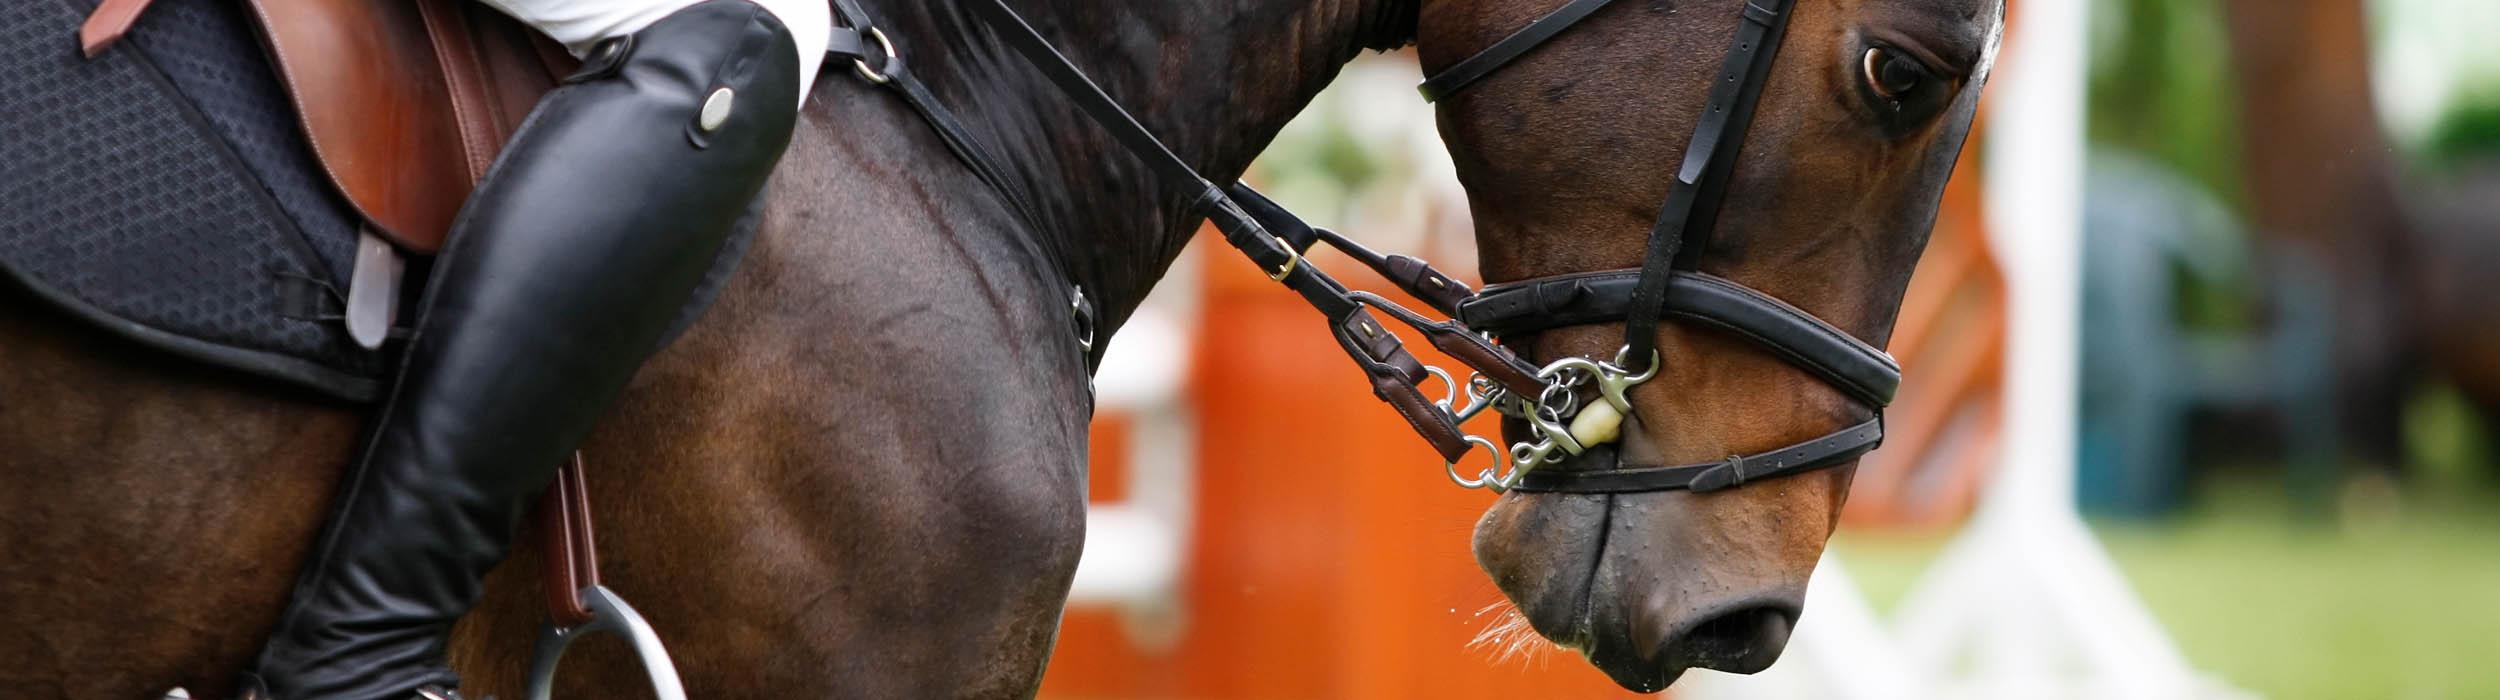 lois-morgan-equine-osteopath-swansea.jpg